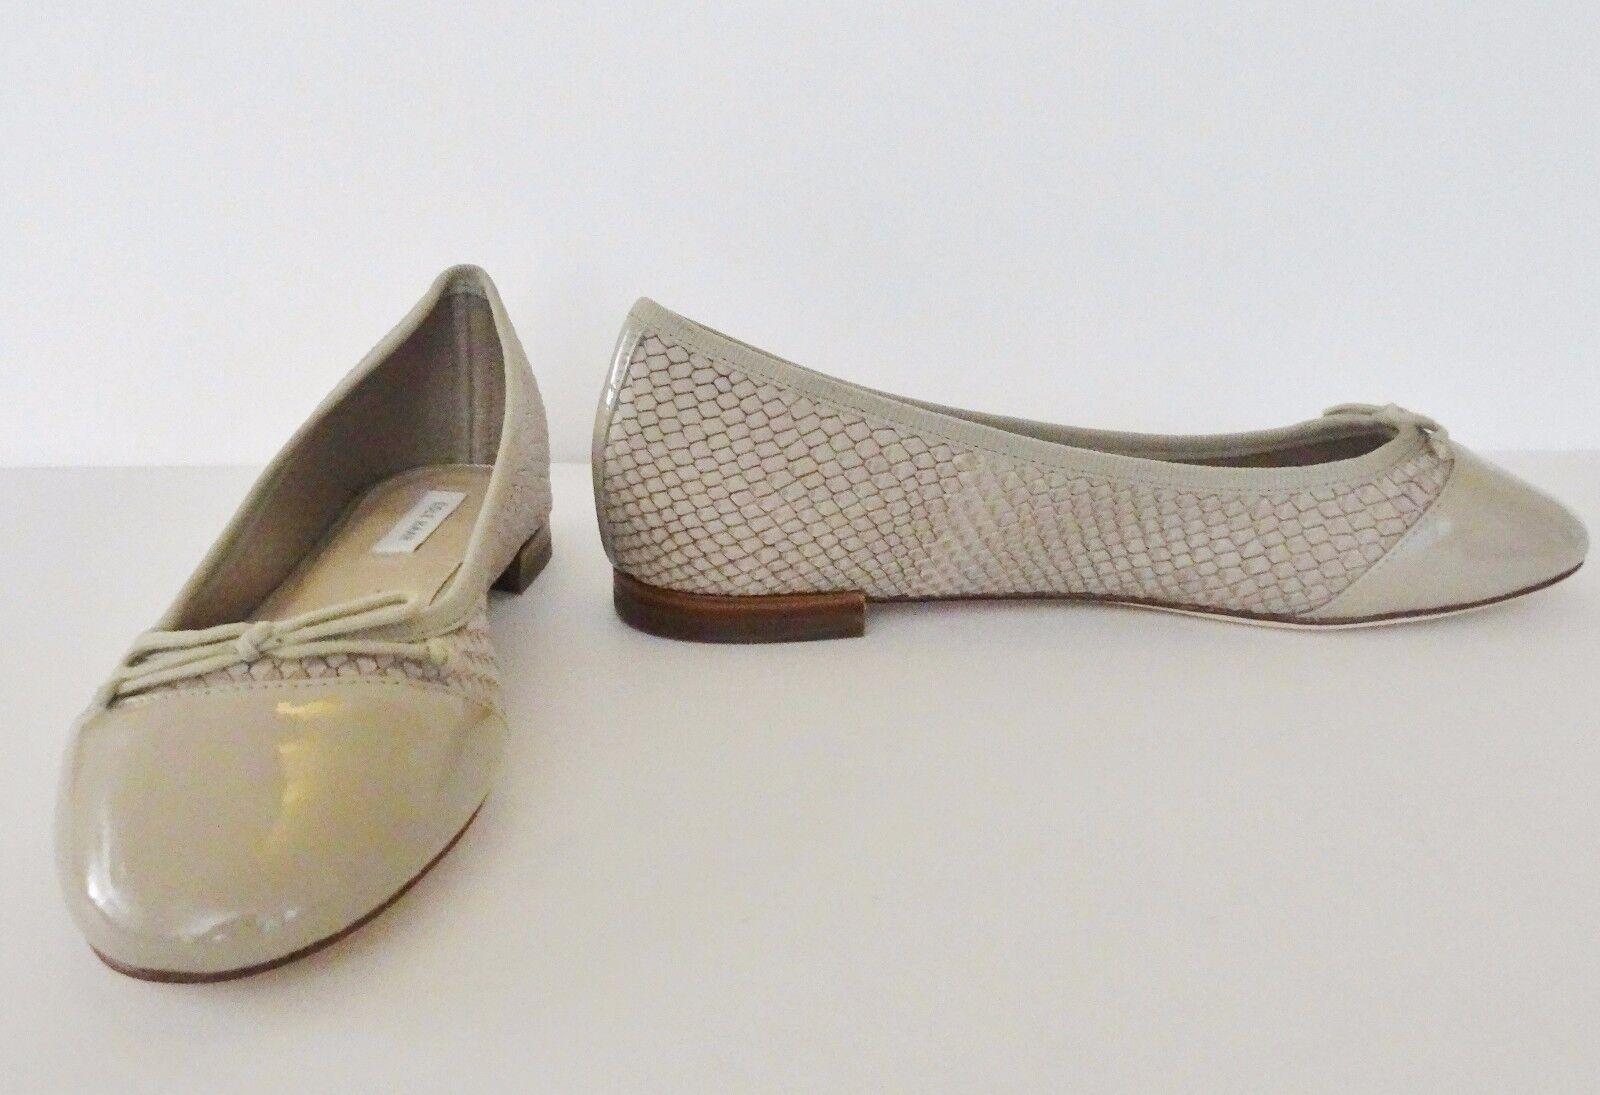 NIb Cole Haan Sarina Snake Embossed Leder Ballet Flat Schuhes Sz 5.5 M Nude 179